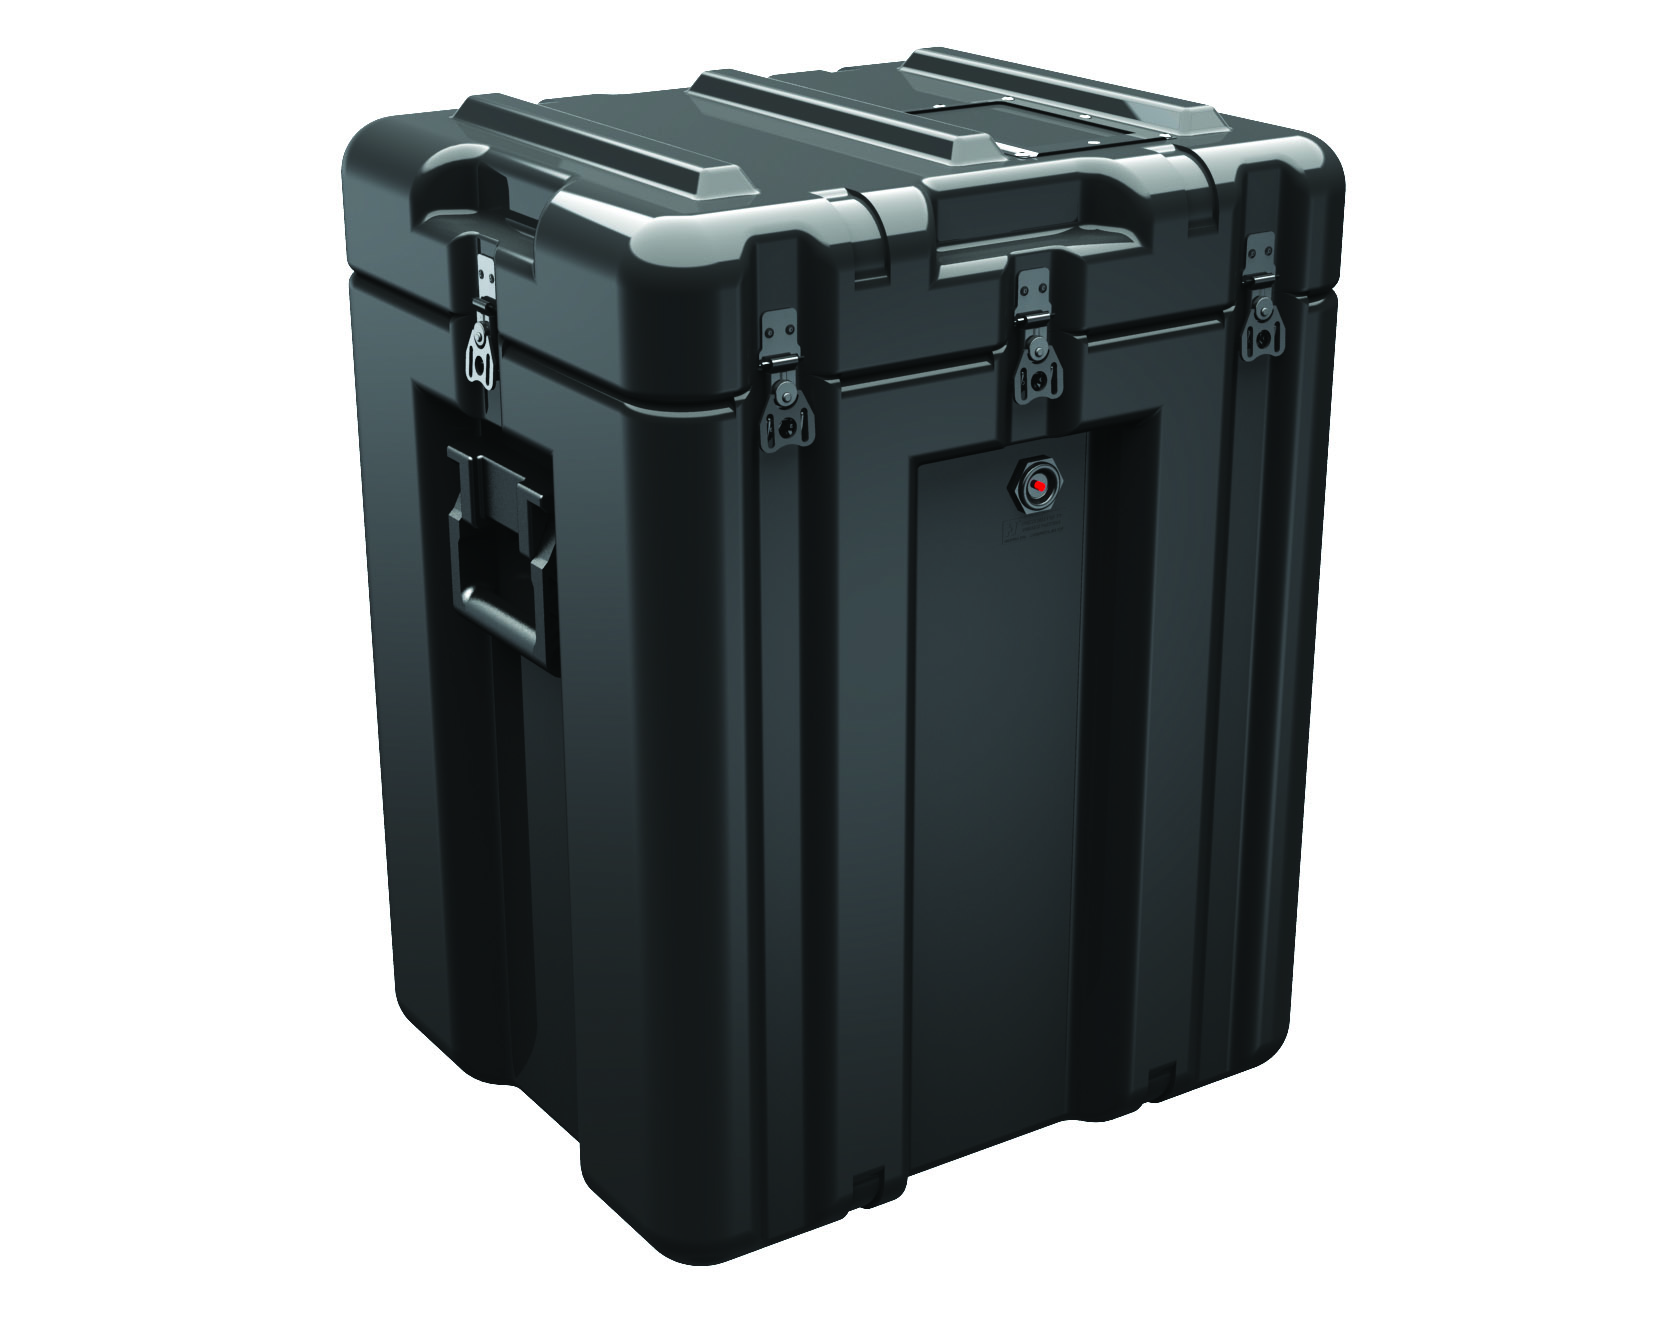 AL1814-2204 - AL1814-2204 Pelican Military Storage Containers